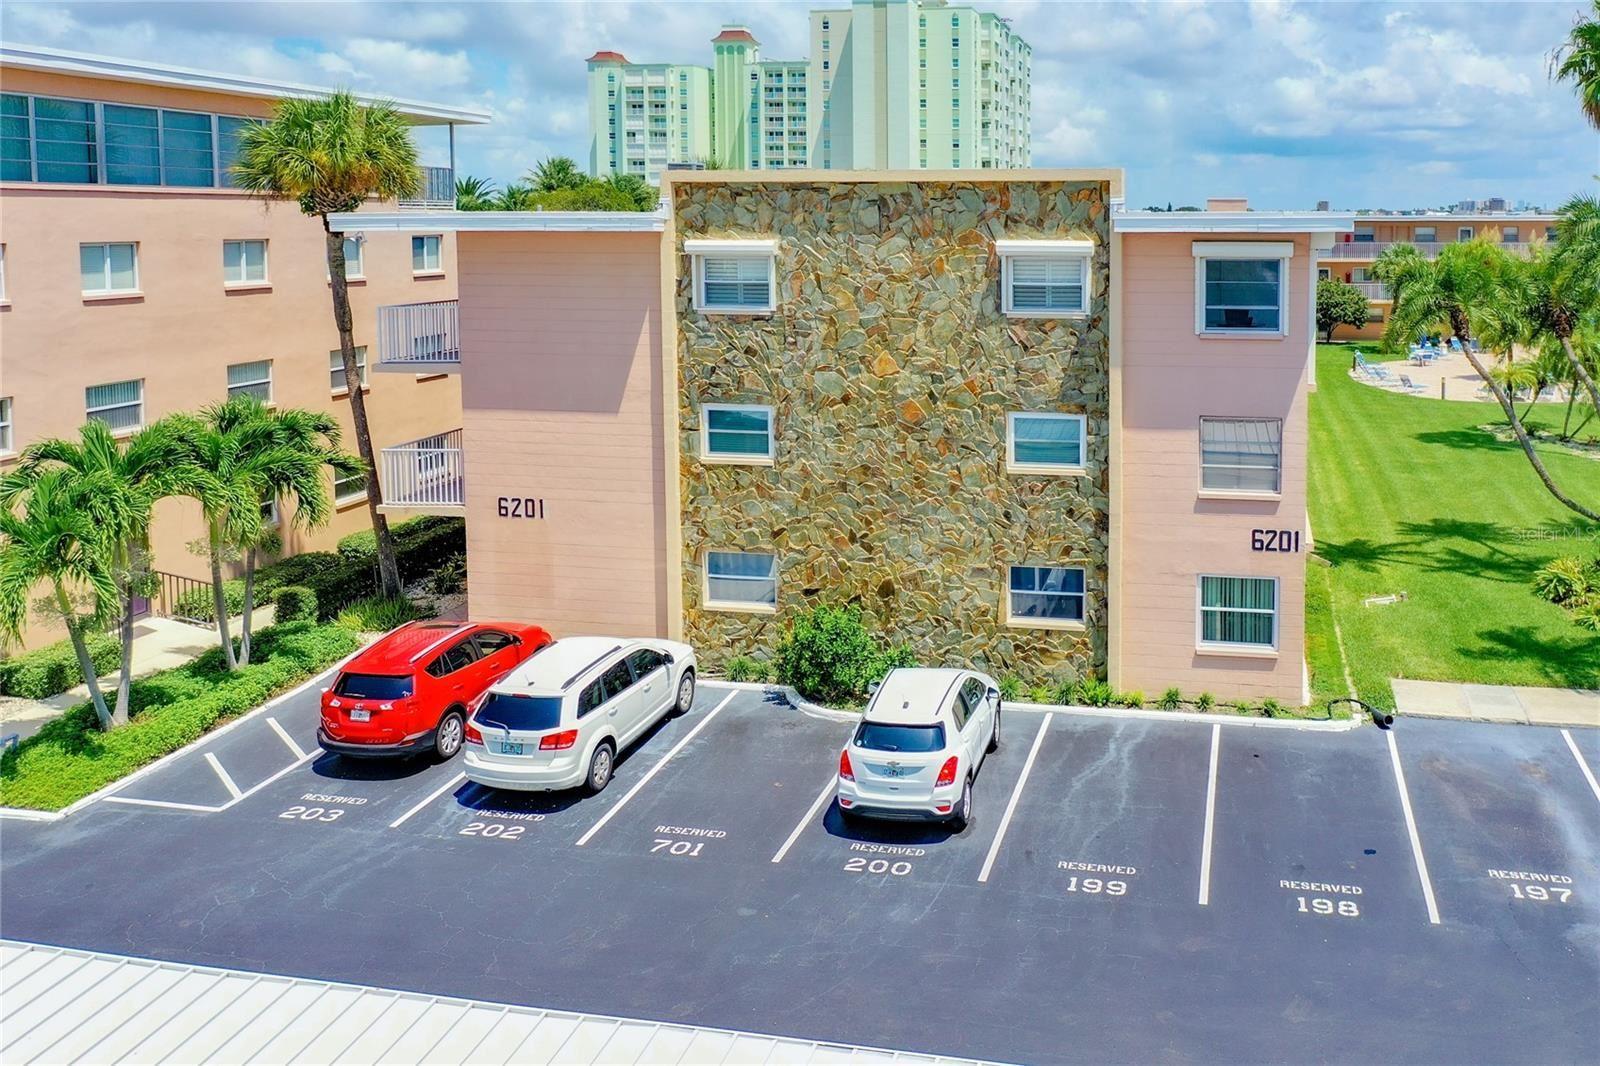 6201 2ND STREET E #71, Saint Pete Beach, FL 33706 - #: U8135884